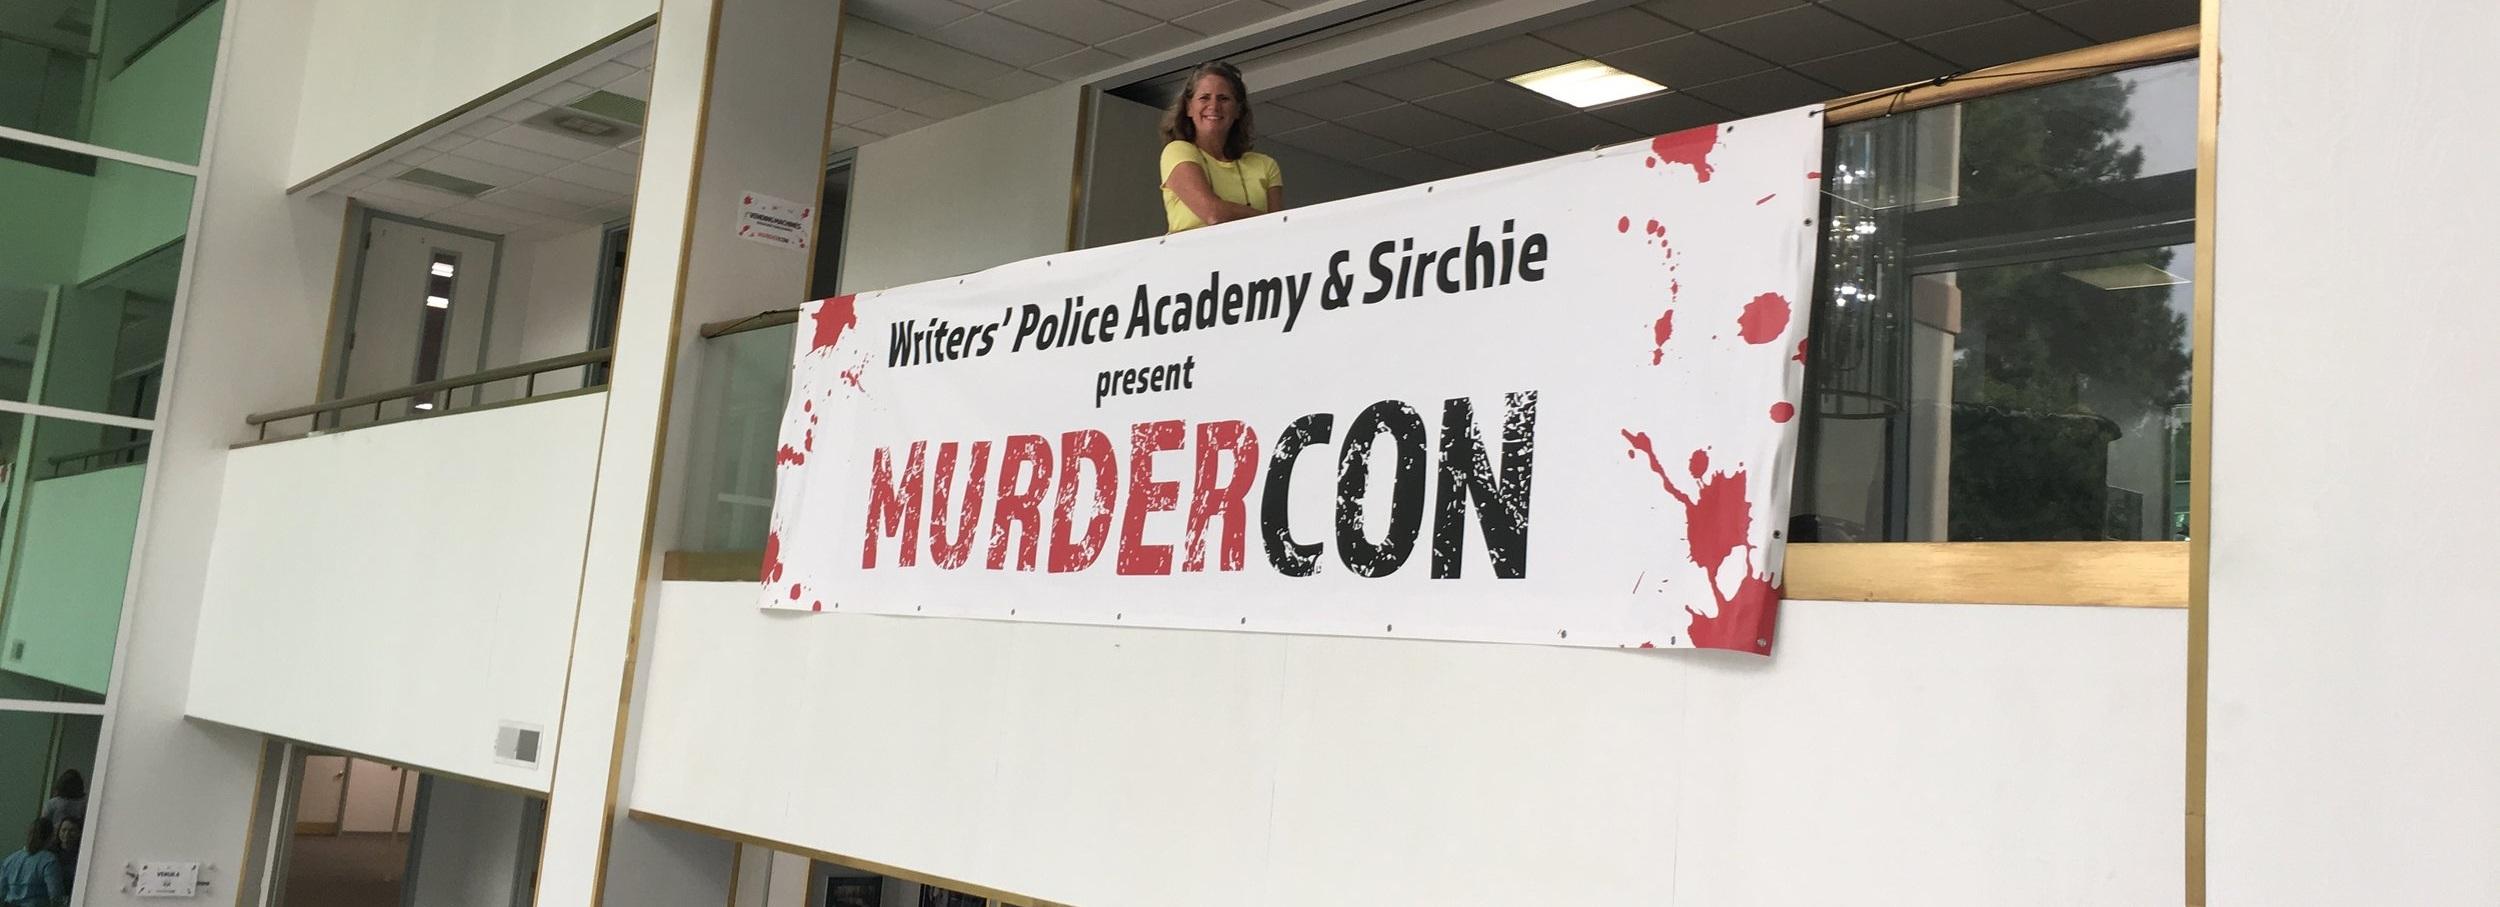 Author Jenna Kernan at Writers Police Academy's MurderCon 2019